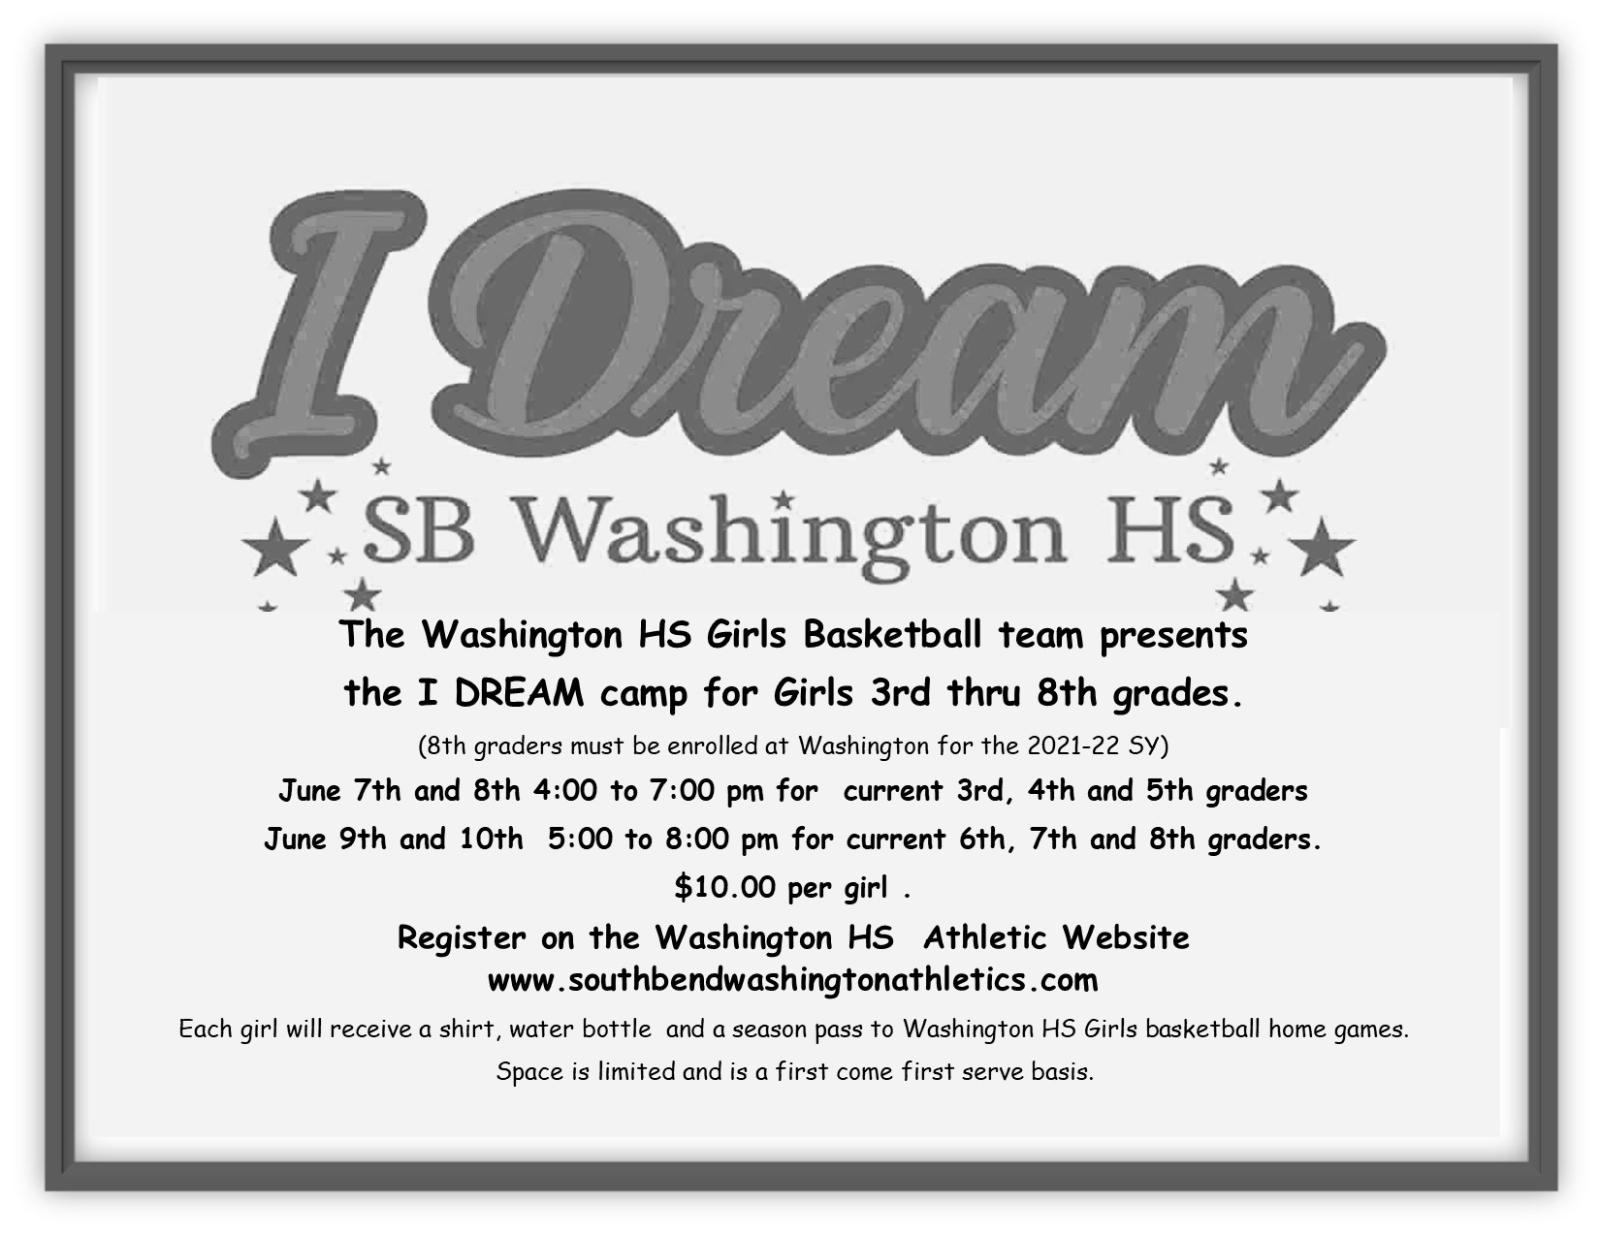 Washington Girls Basketball Camp for 3-8 grade